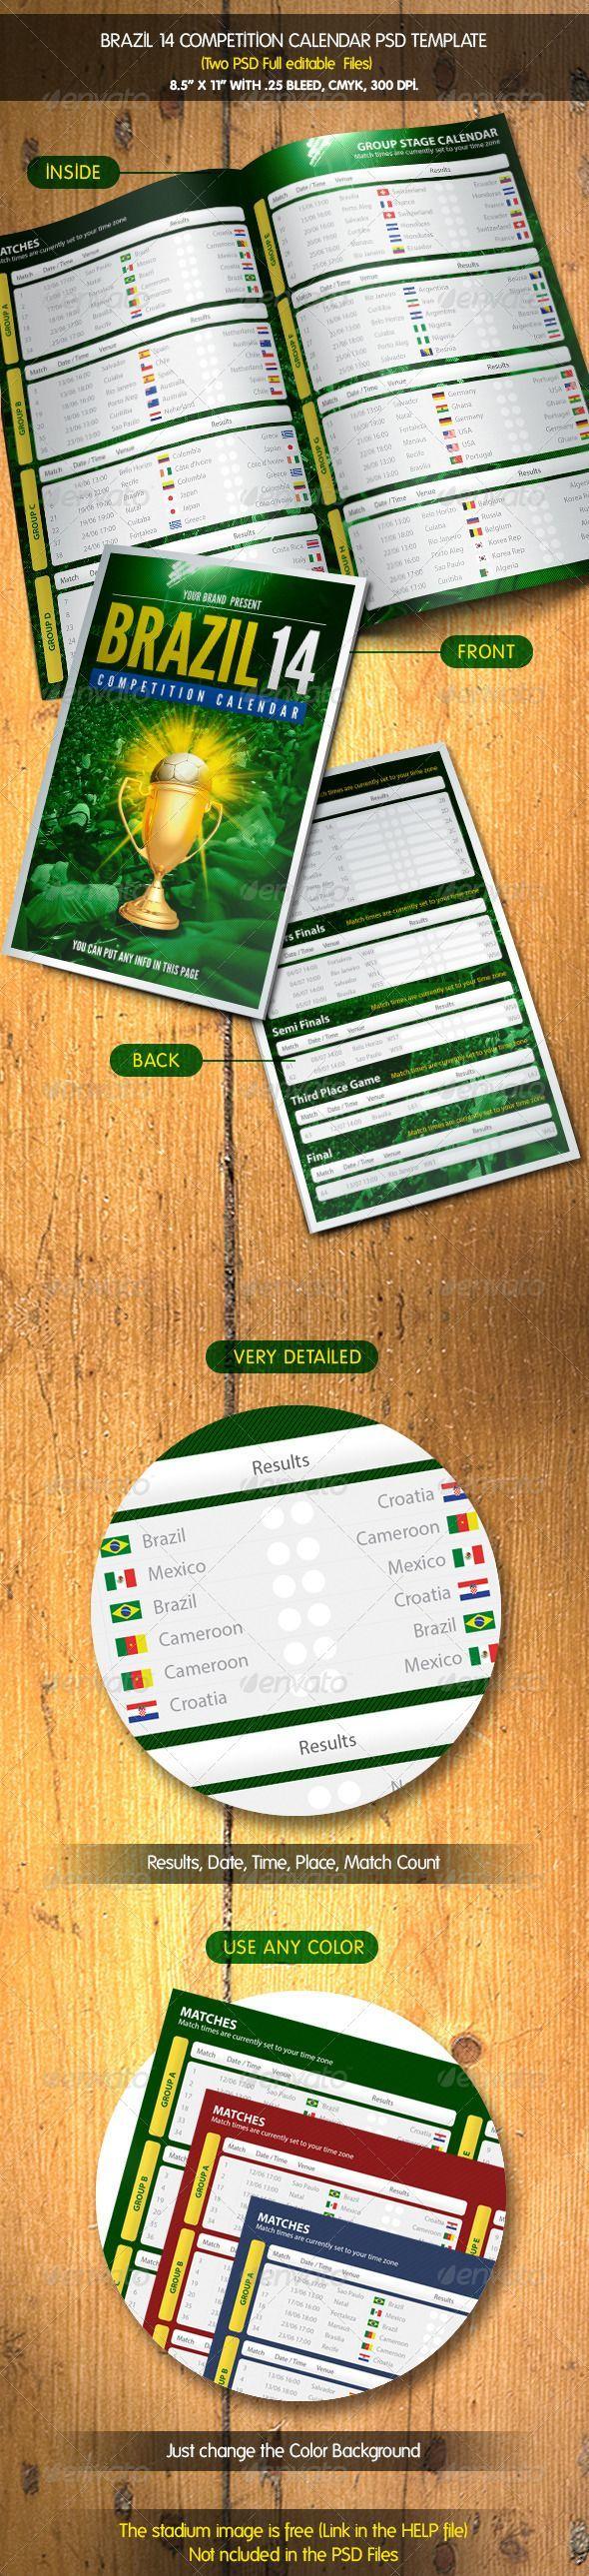 Soccer Brazil 14 Calendar   Match Schedule...